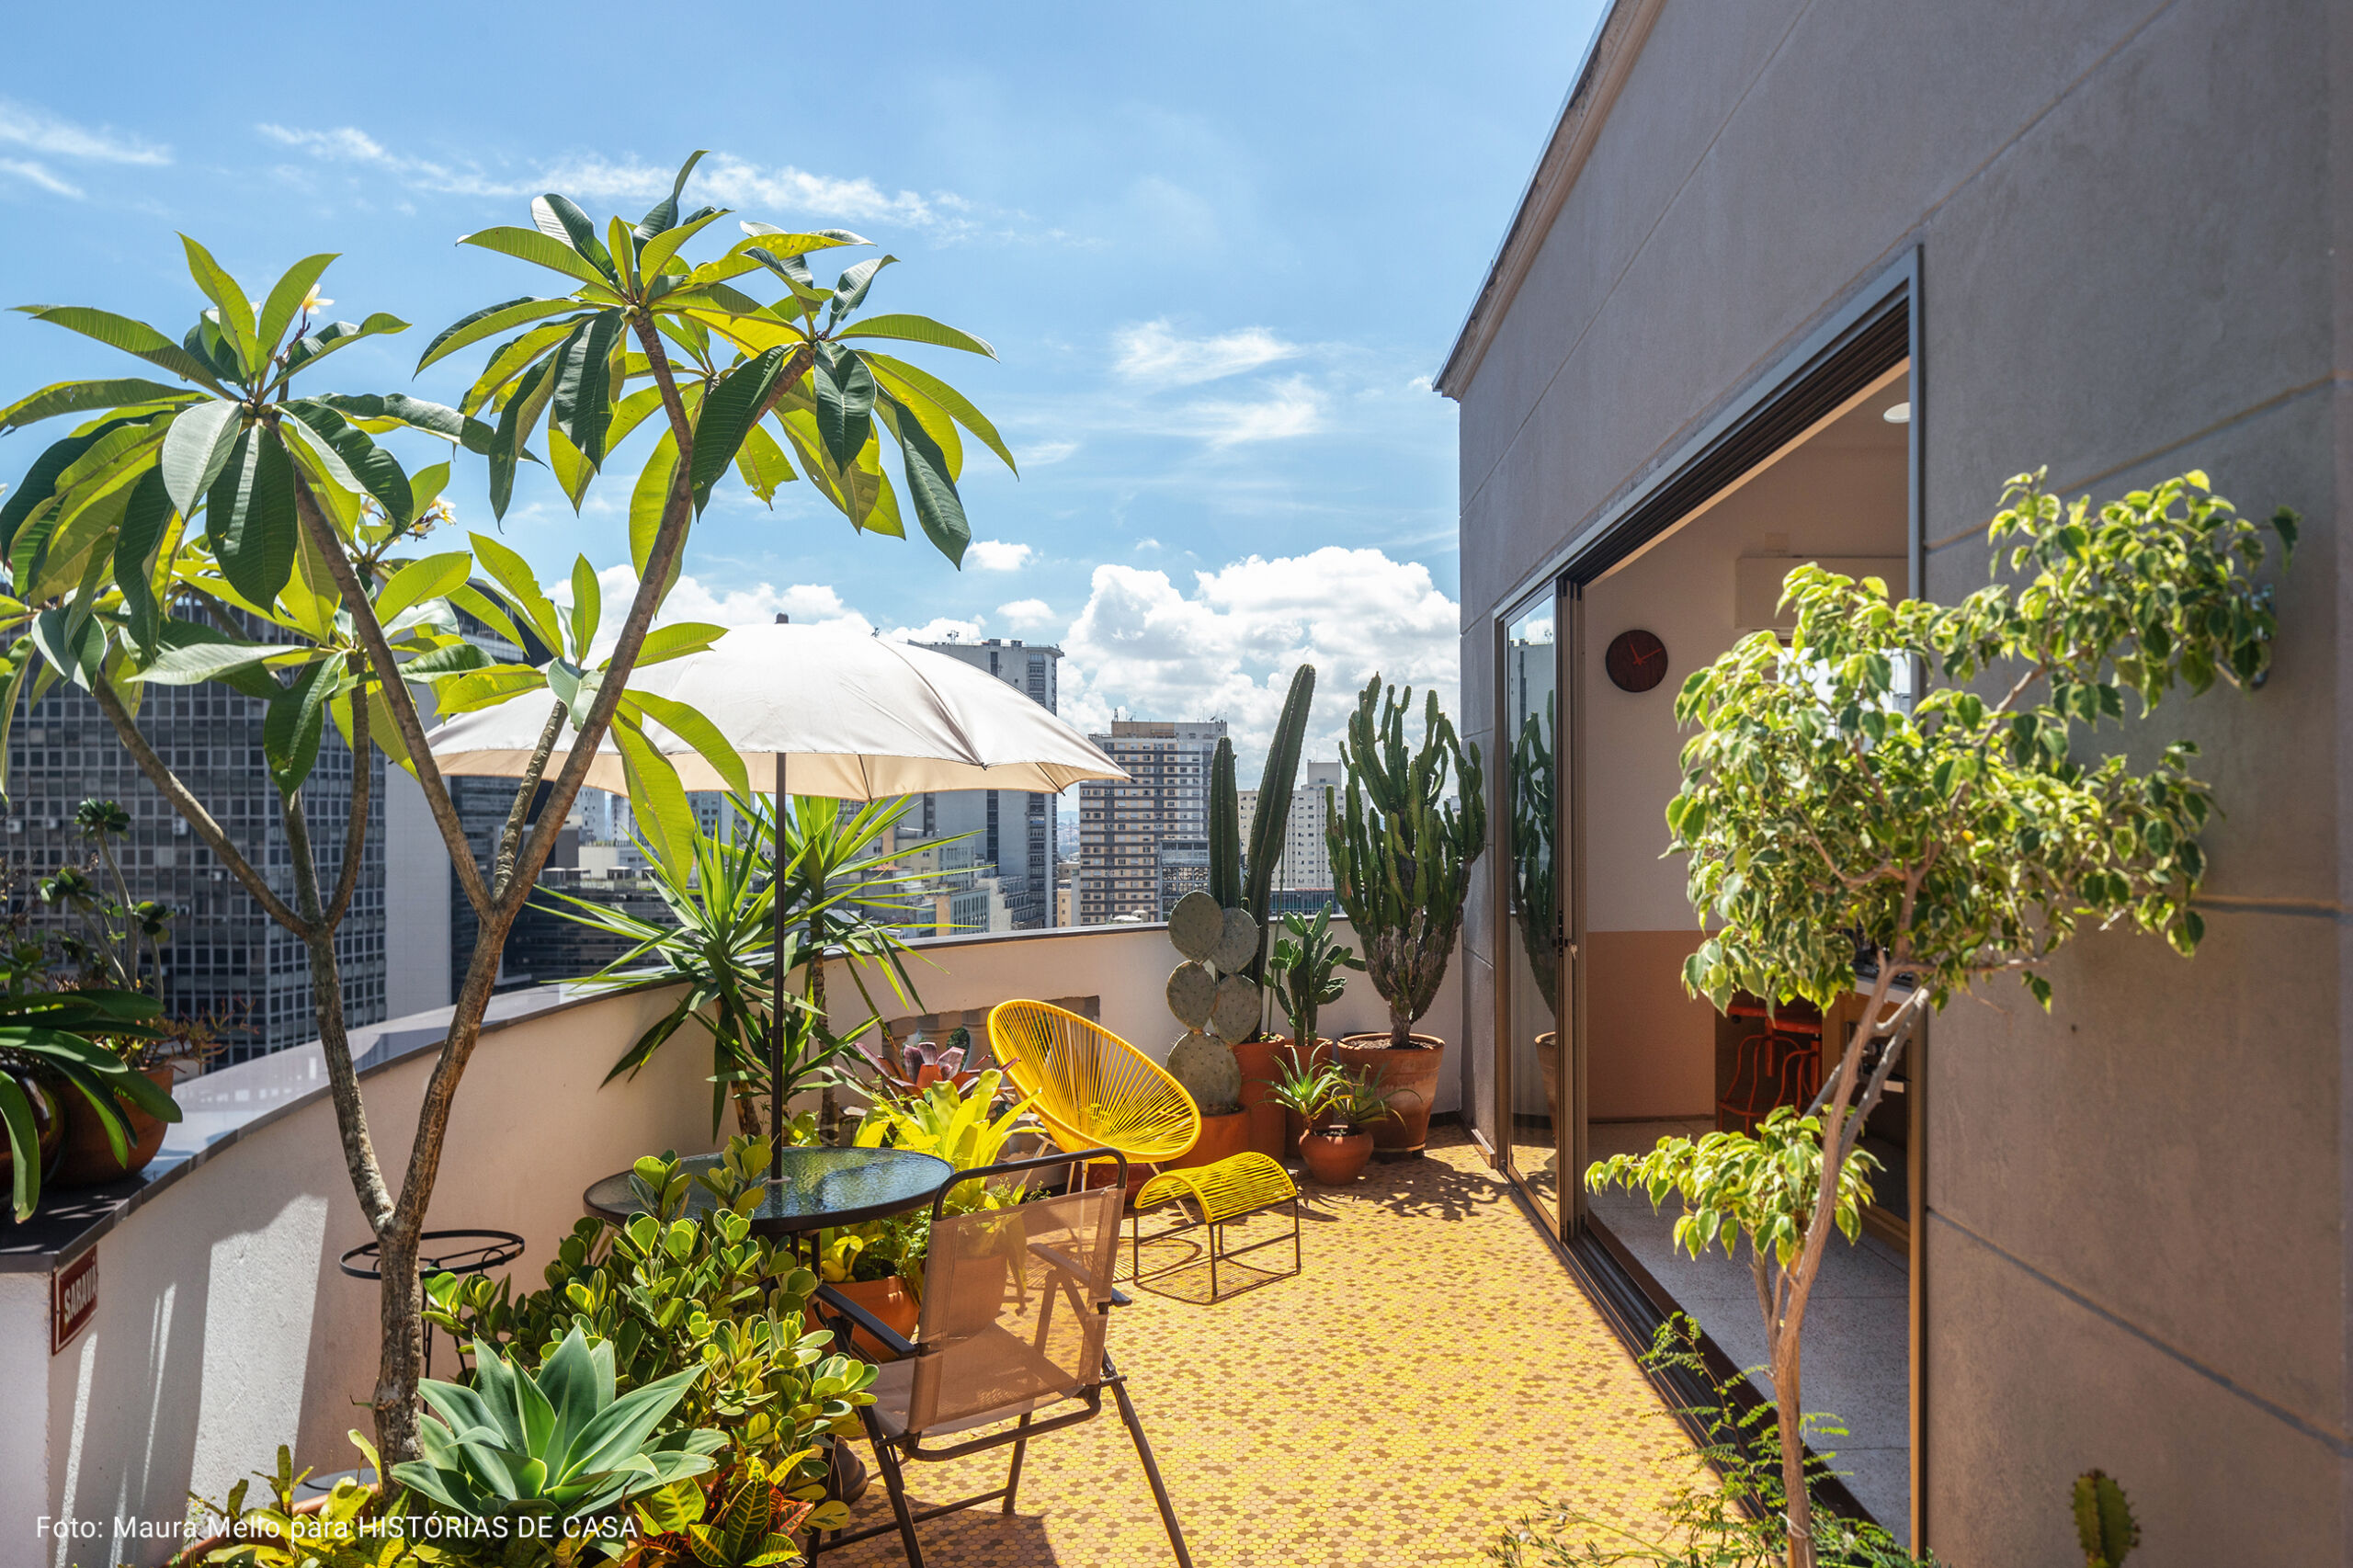 varanda de cobertura com plantas